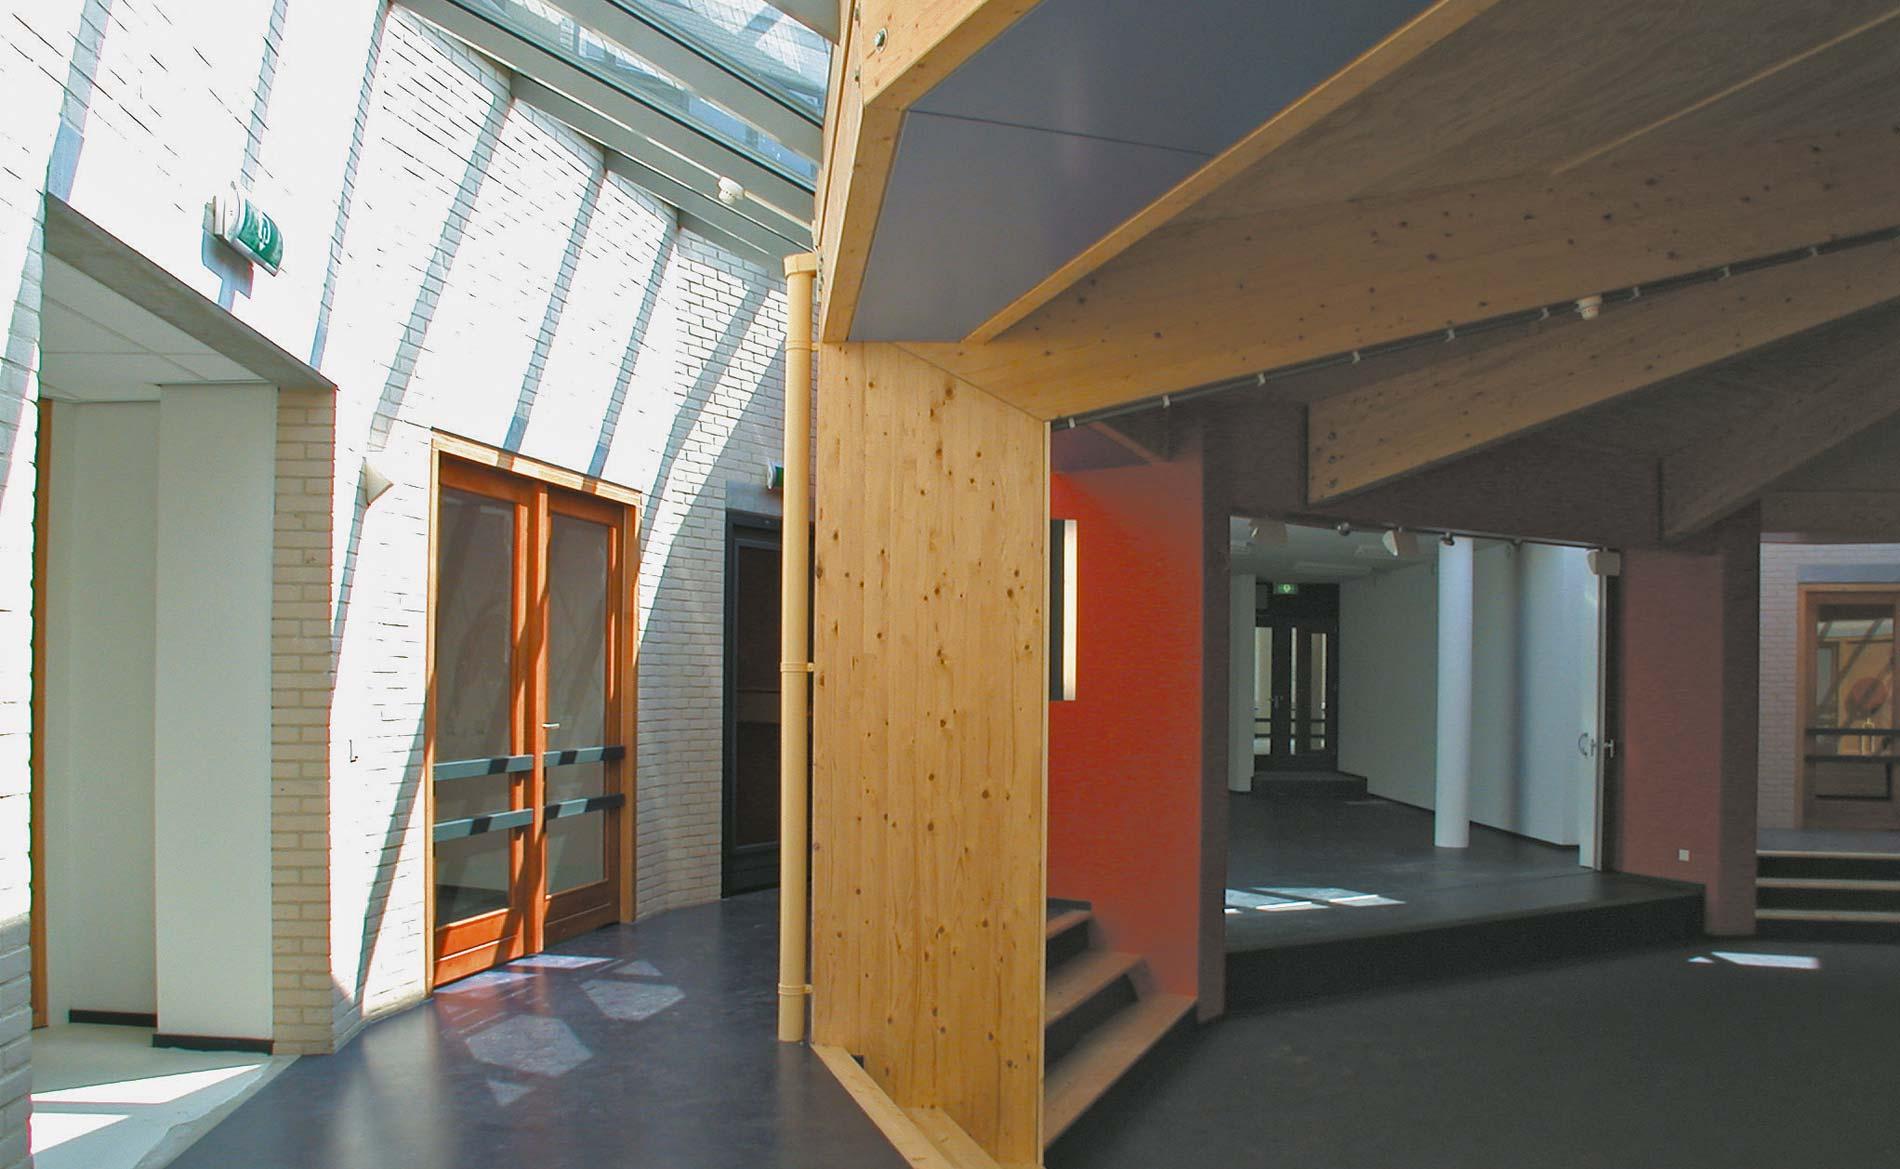 architect duurzaam bouwen Basisschool duurzame school Frisse Scholen Energie 0 Energie nul BBHD architecten Sokkerwei Castricum